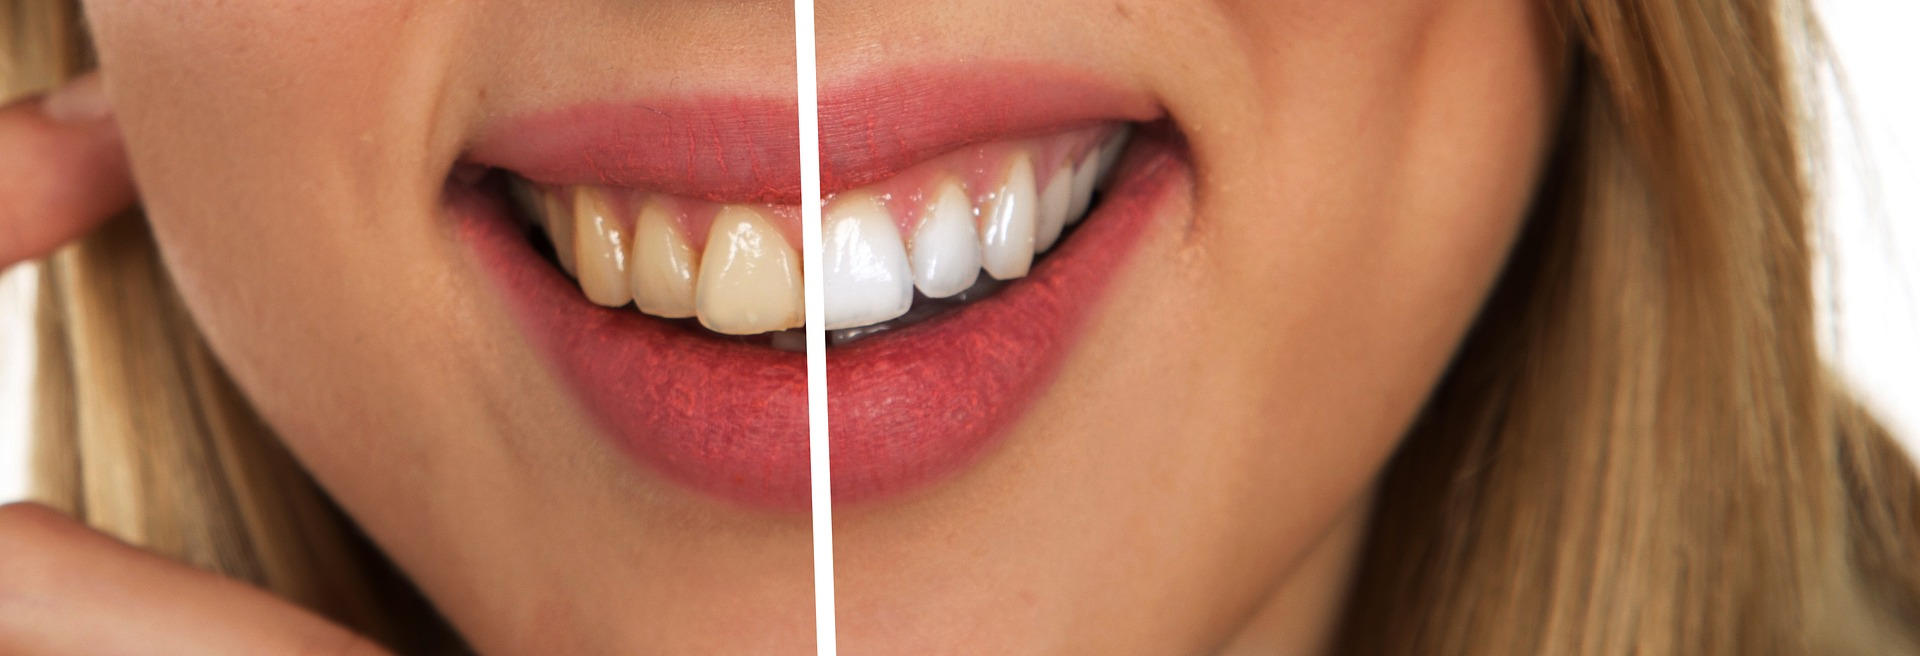 blanchiment - dentiste francais barcelone - Turo Park dental and medical center